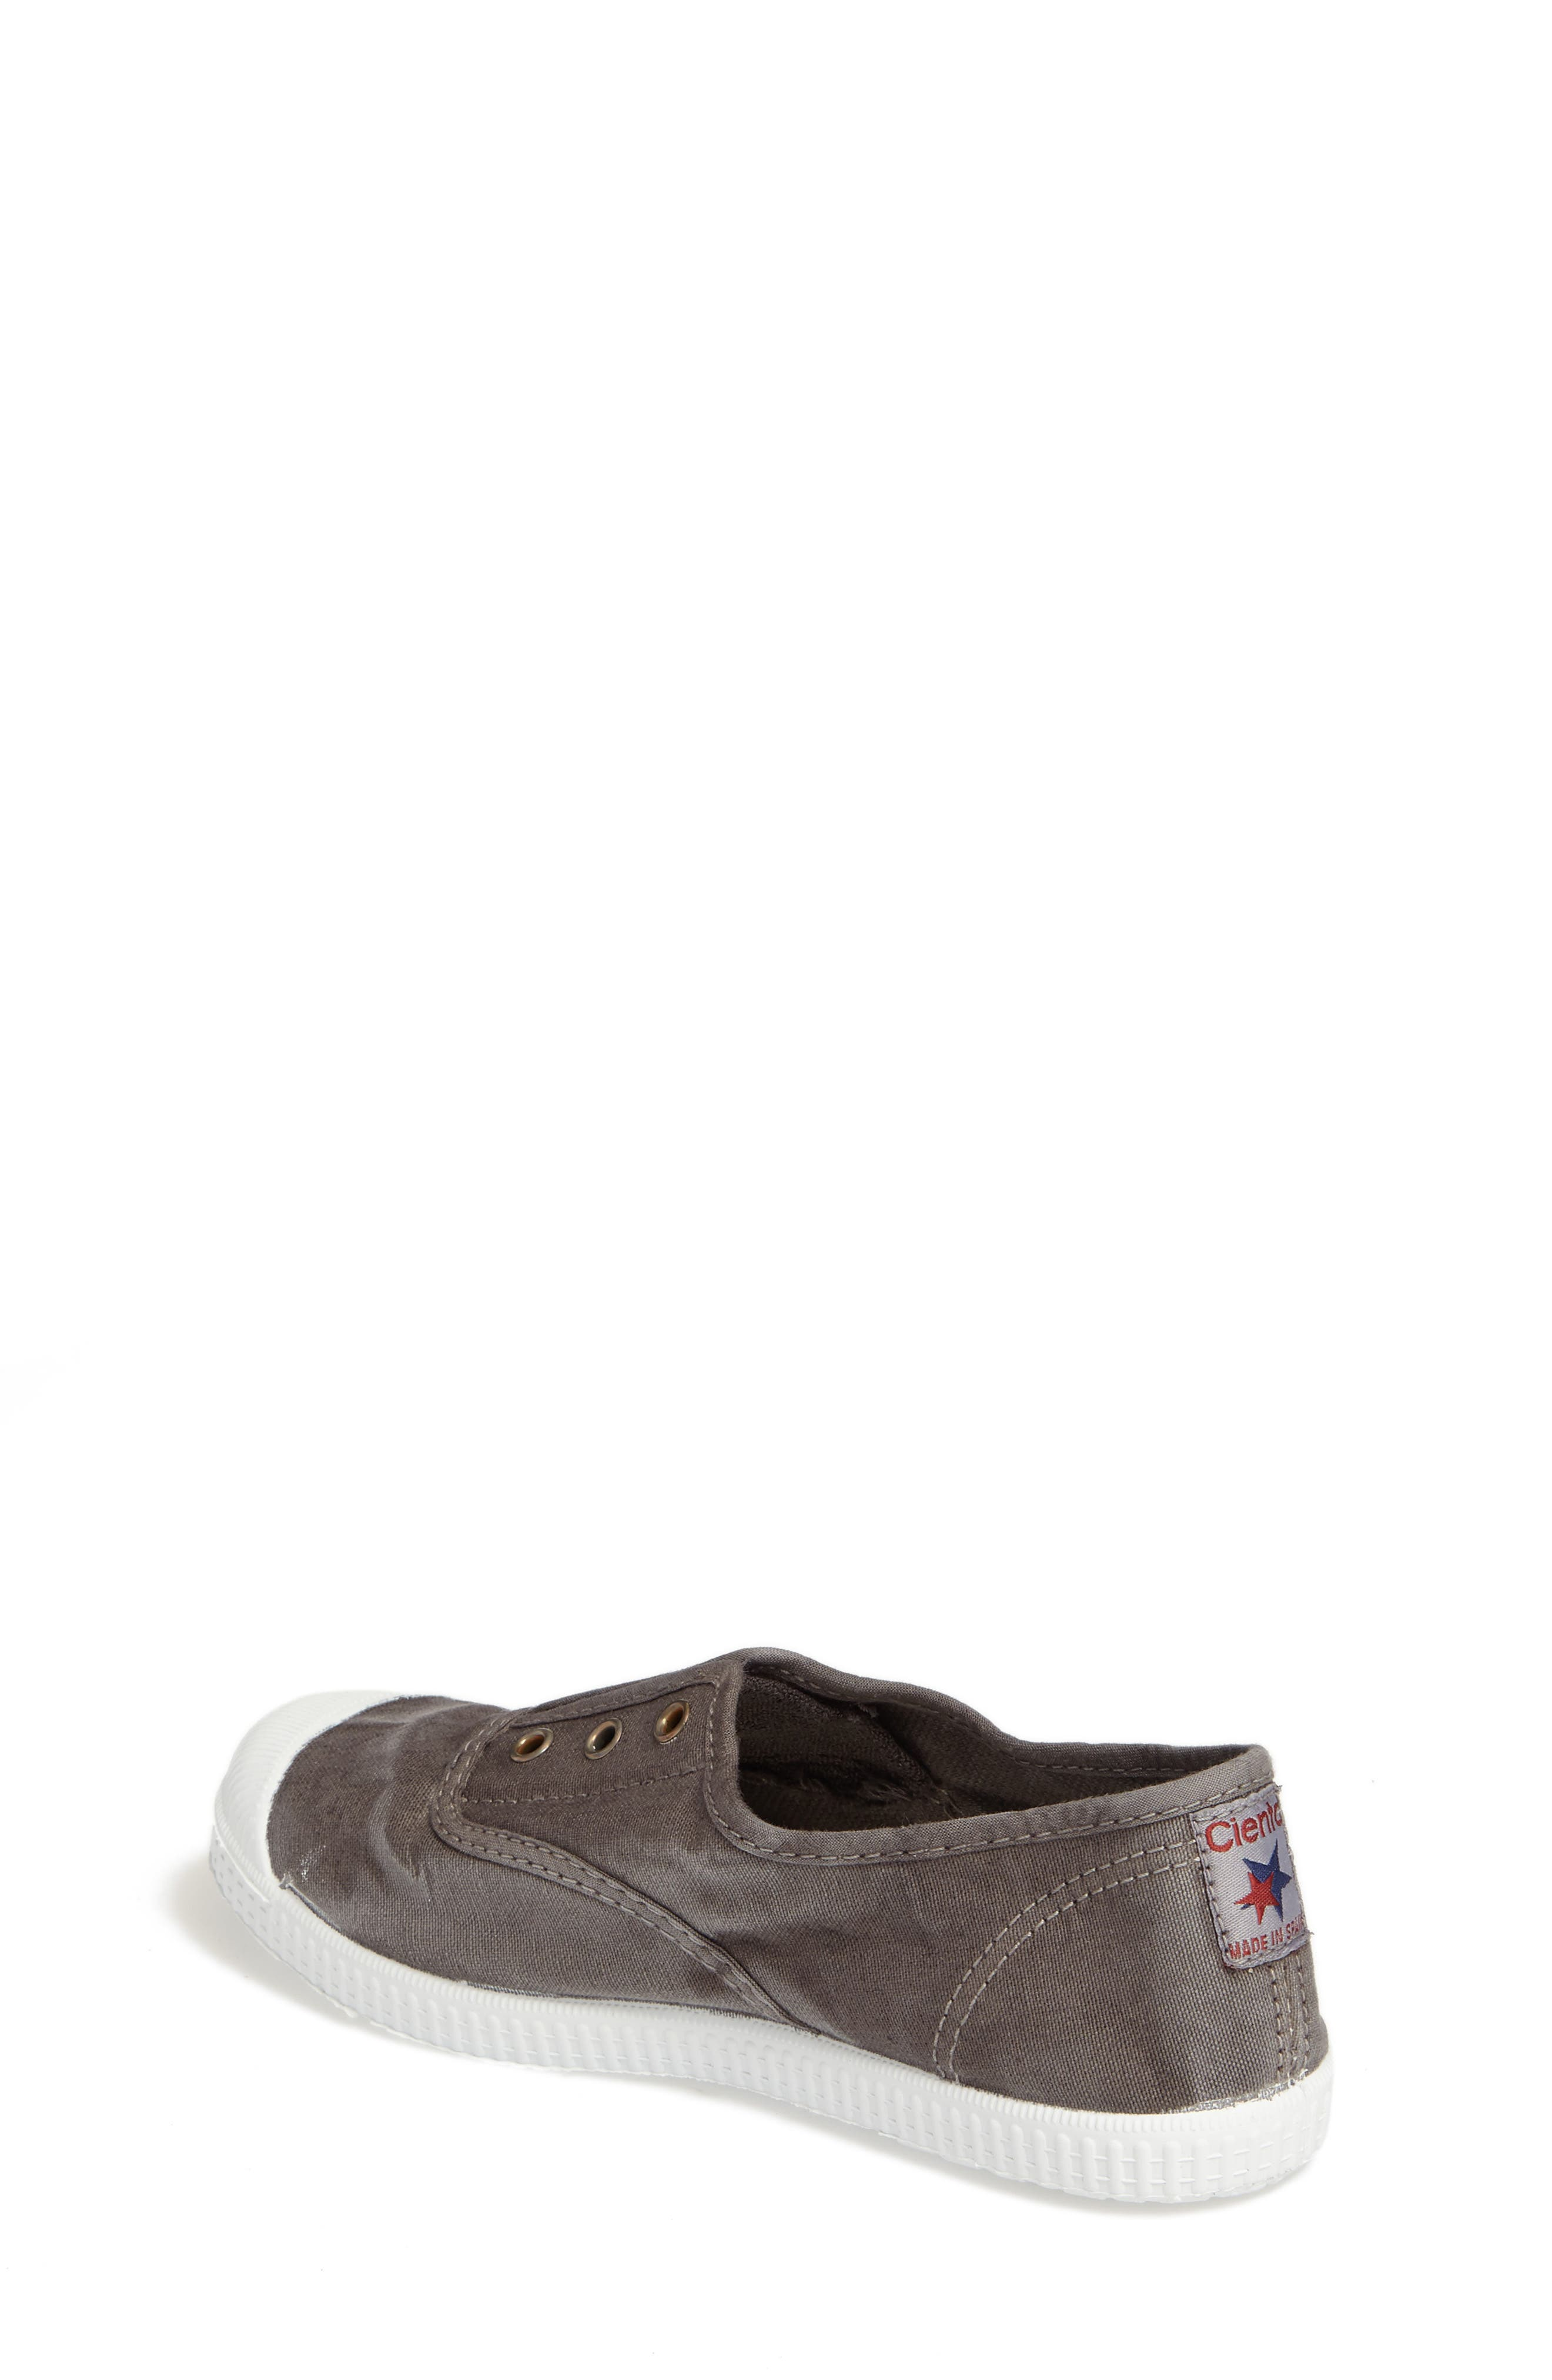 Alternate Image 2  - Cienta Laceless Slip-On Sneaker (Walker, Toddler, Little Kid & Big Kid)